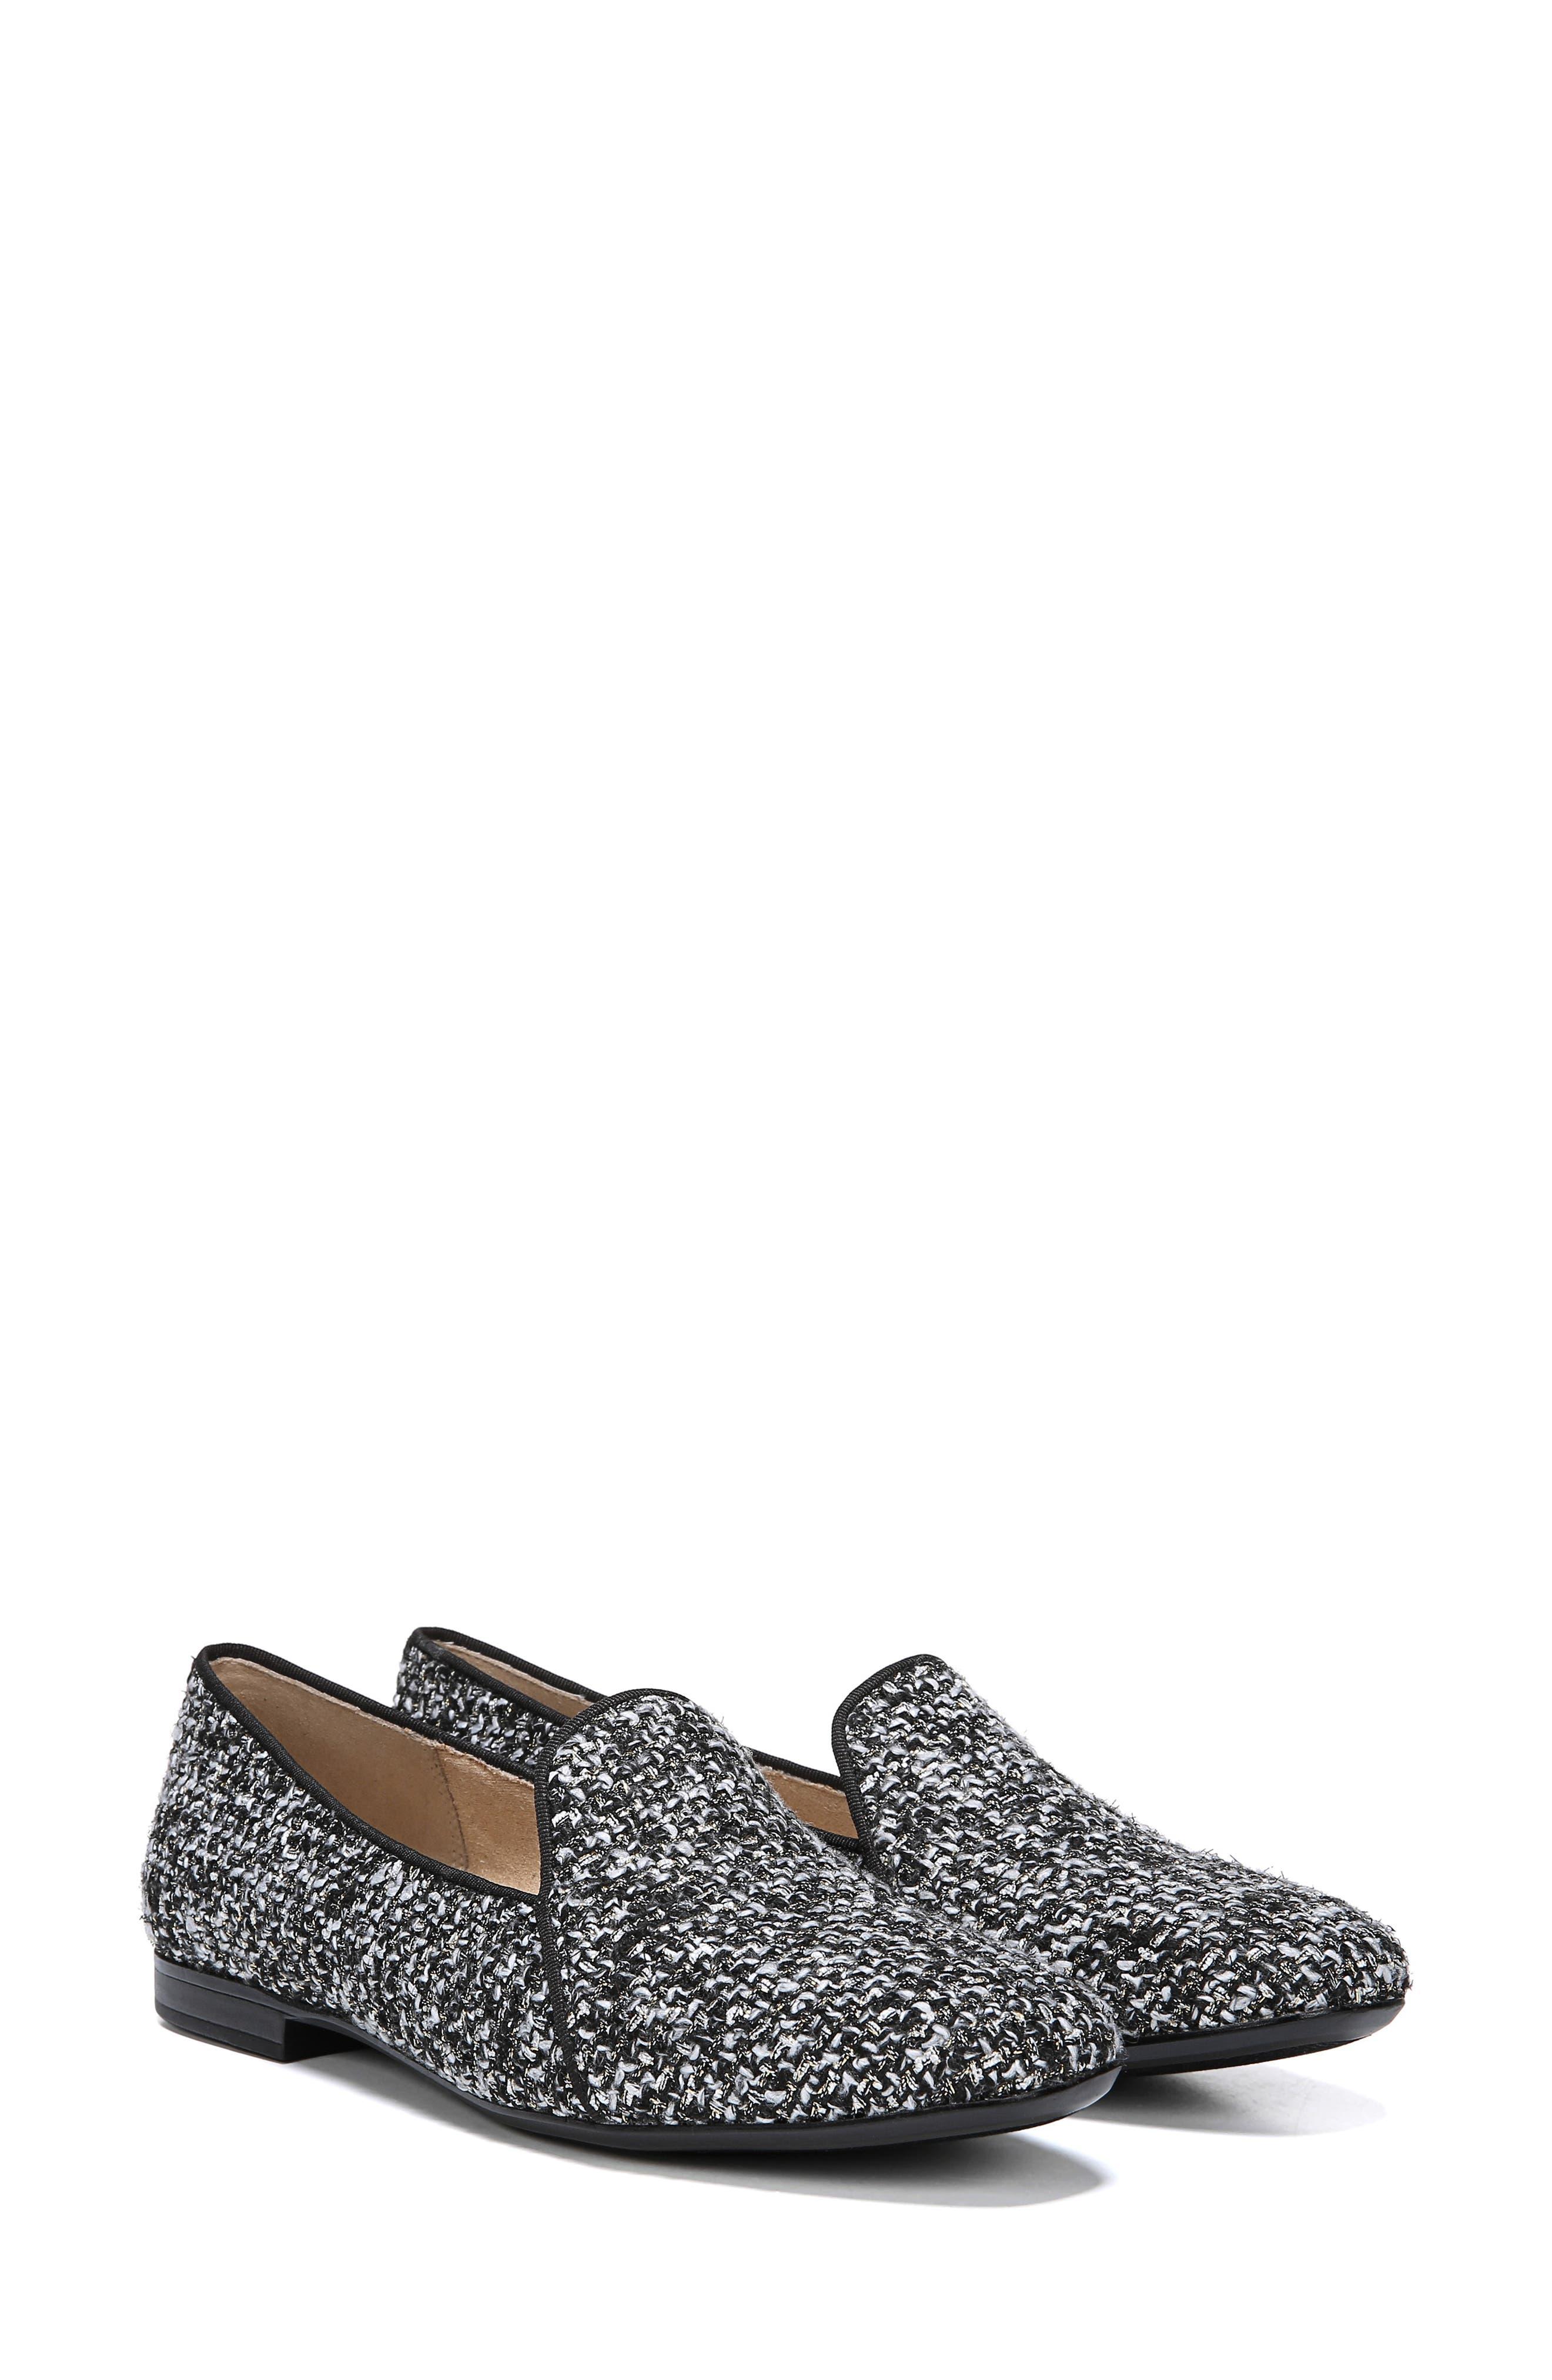 Emiline 2 Loafer,                             Alternate thumbnail 6, color,                             BLACK/ WHITE TWEED FABRIC